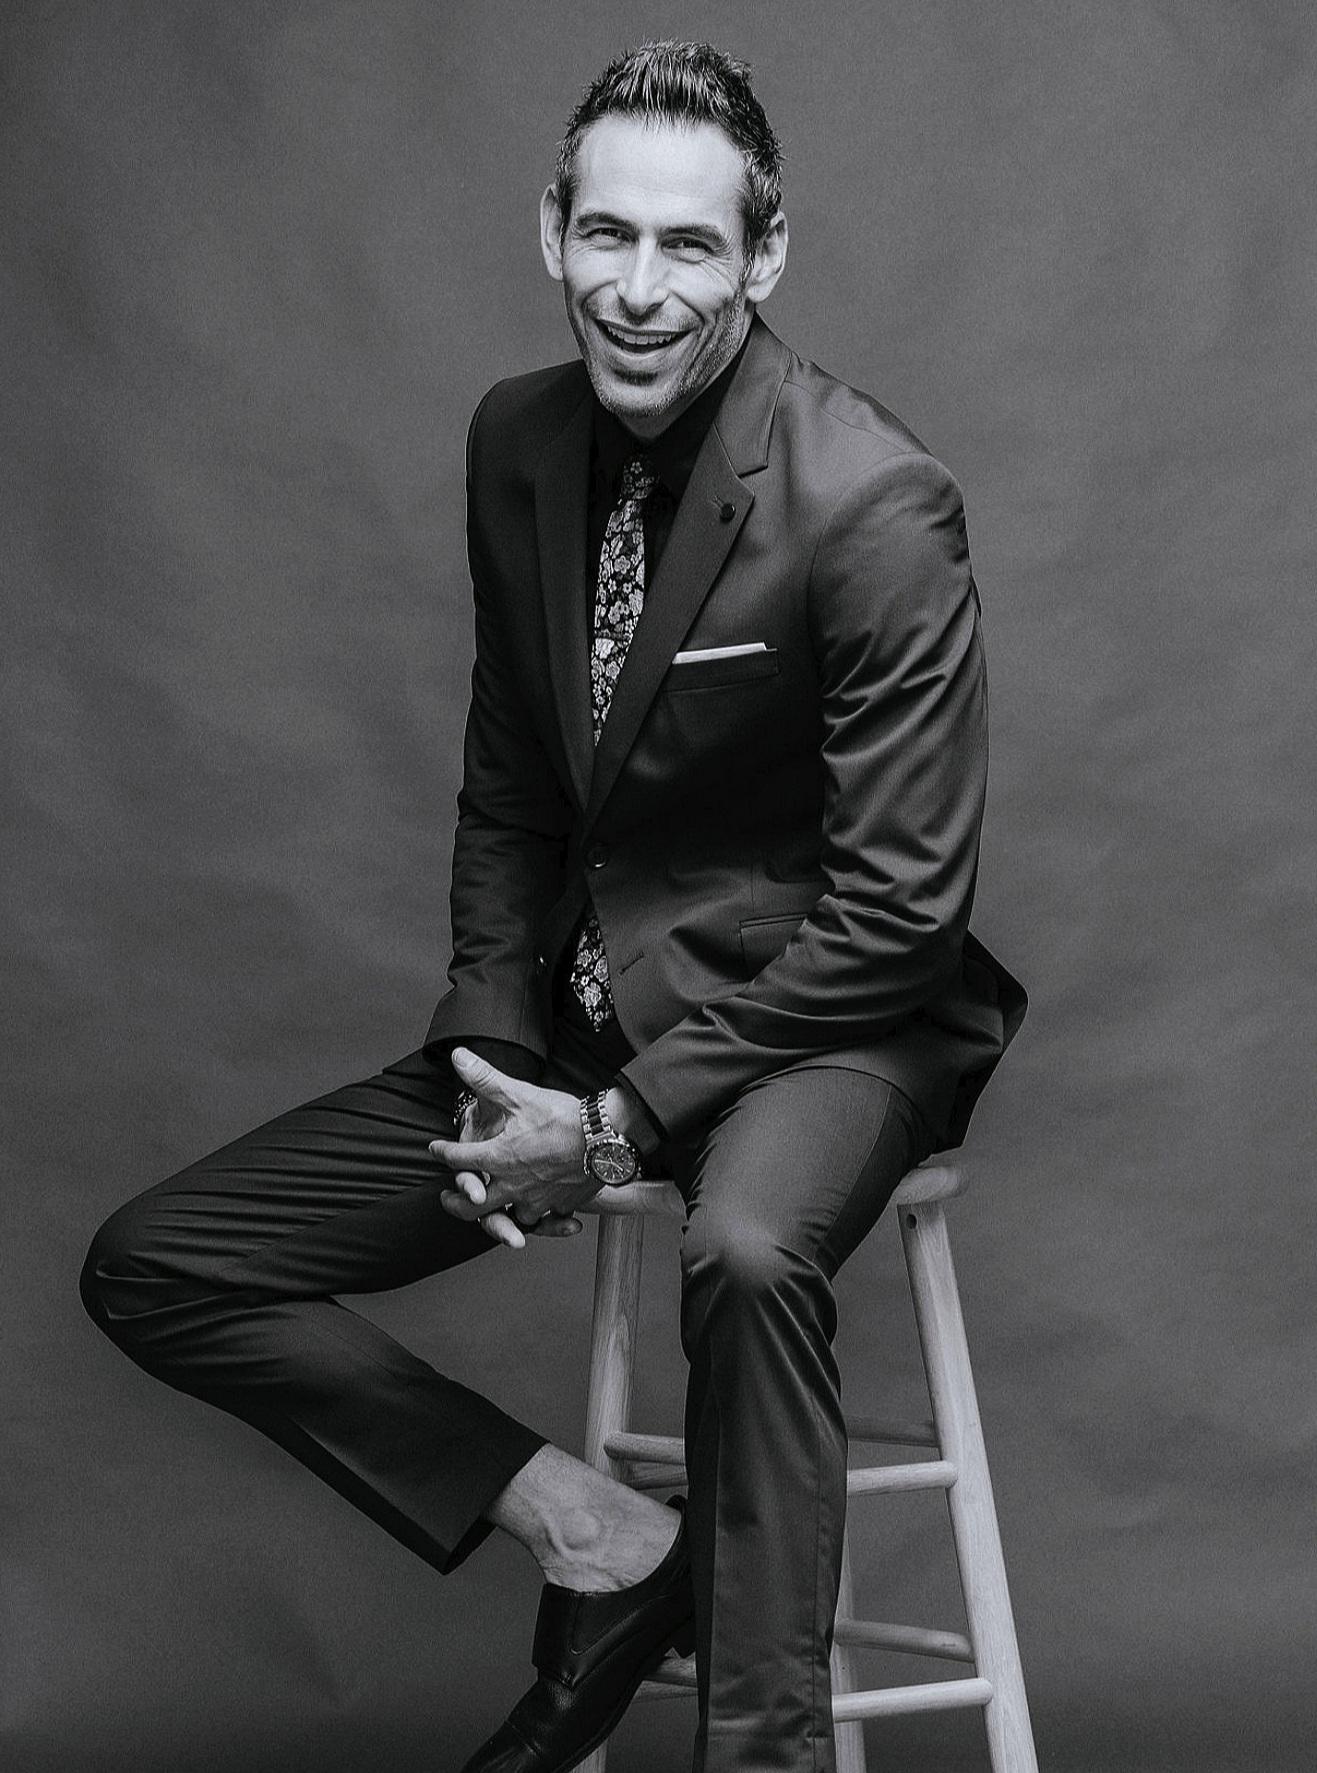 CHRIS J. EVANS - OWNER & CREATIVE DIRECTORHAWAII Magazine Top Wedding photographersThe Knot Best of Weddings 2016, 2017, 2018, 2019Wedding Wire Couples Choice 2016, 2017, 2018PRINCIPAL PHOTOGRAPHER